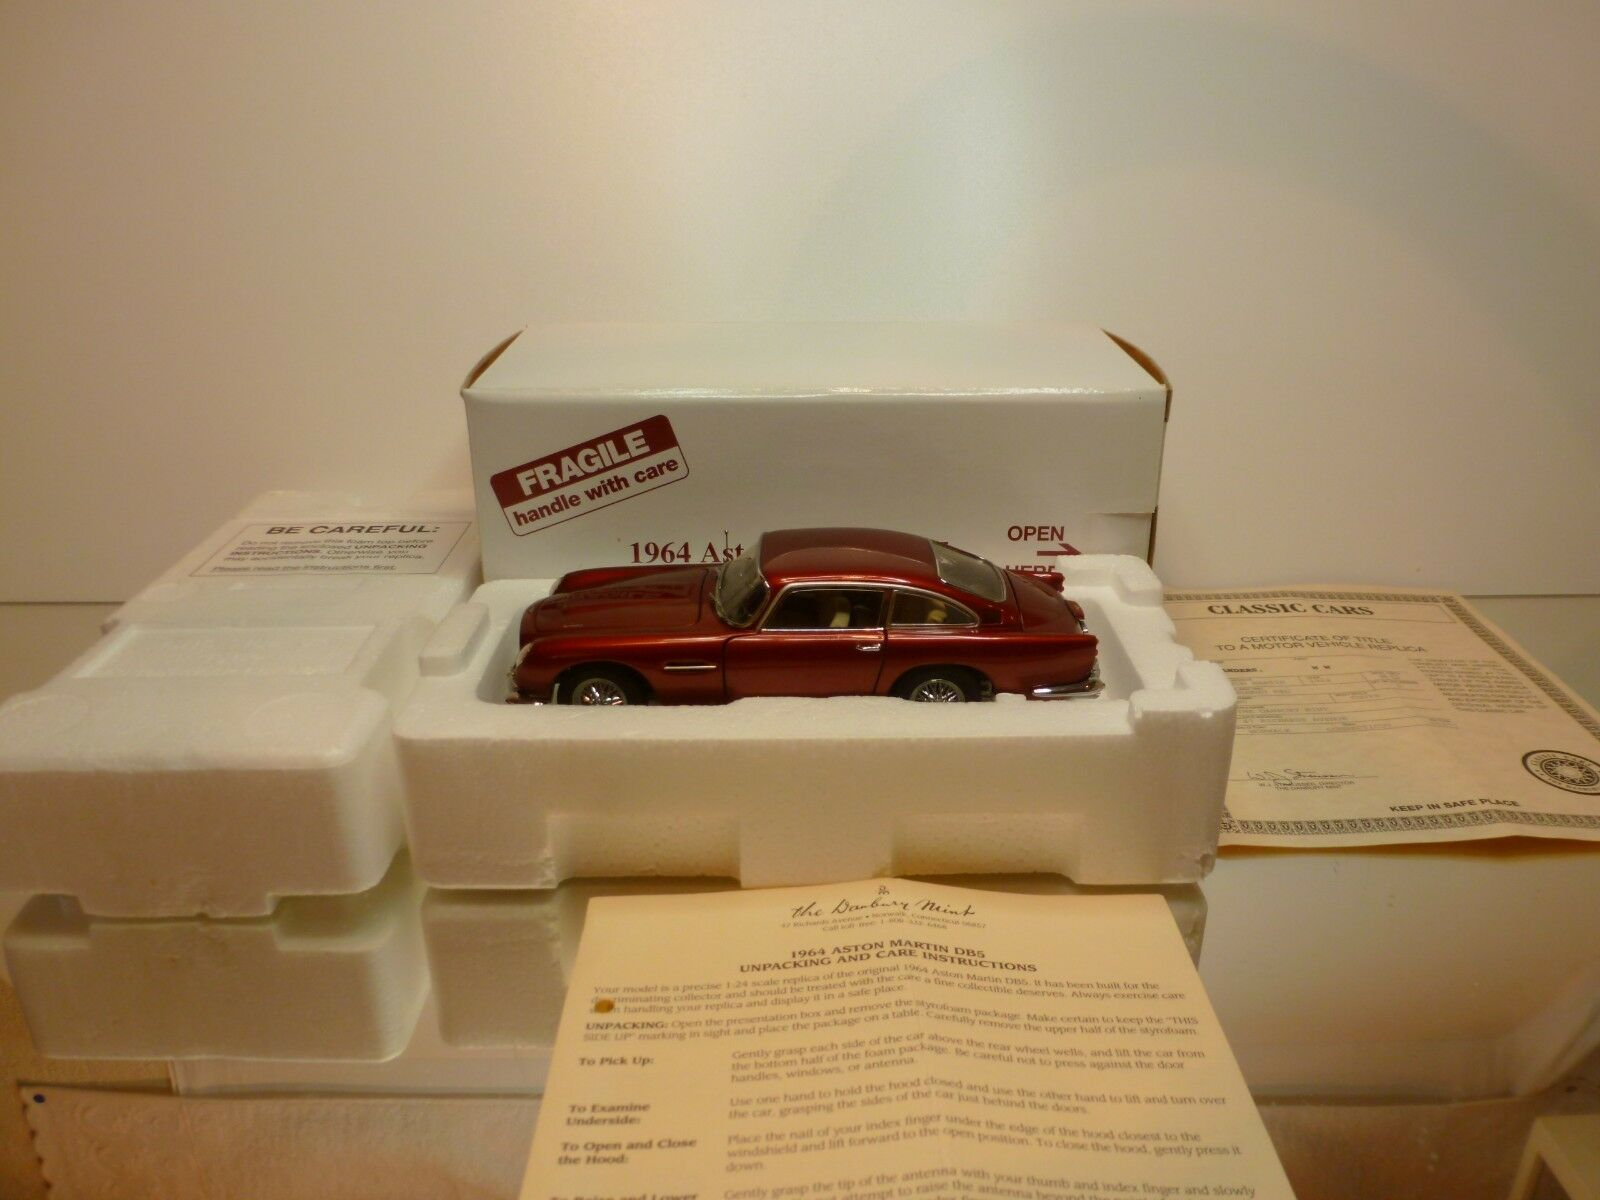 DANBURY MINT ASTON MARTIN DB5 1964 1 24 - EXCELLENT IN BOX